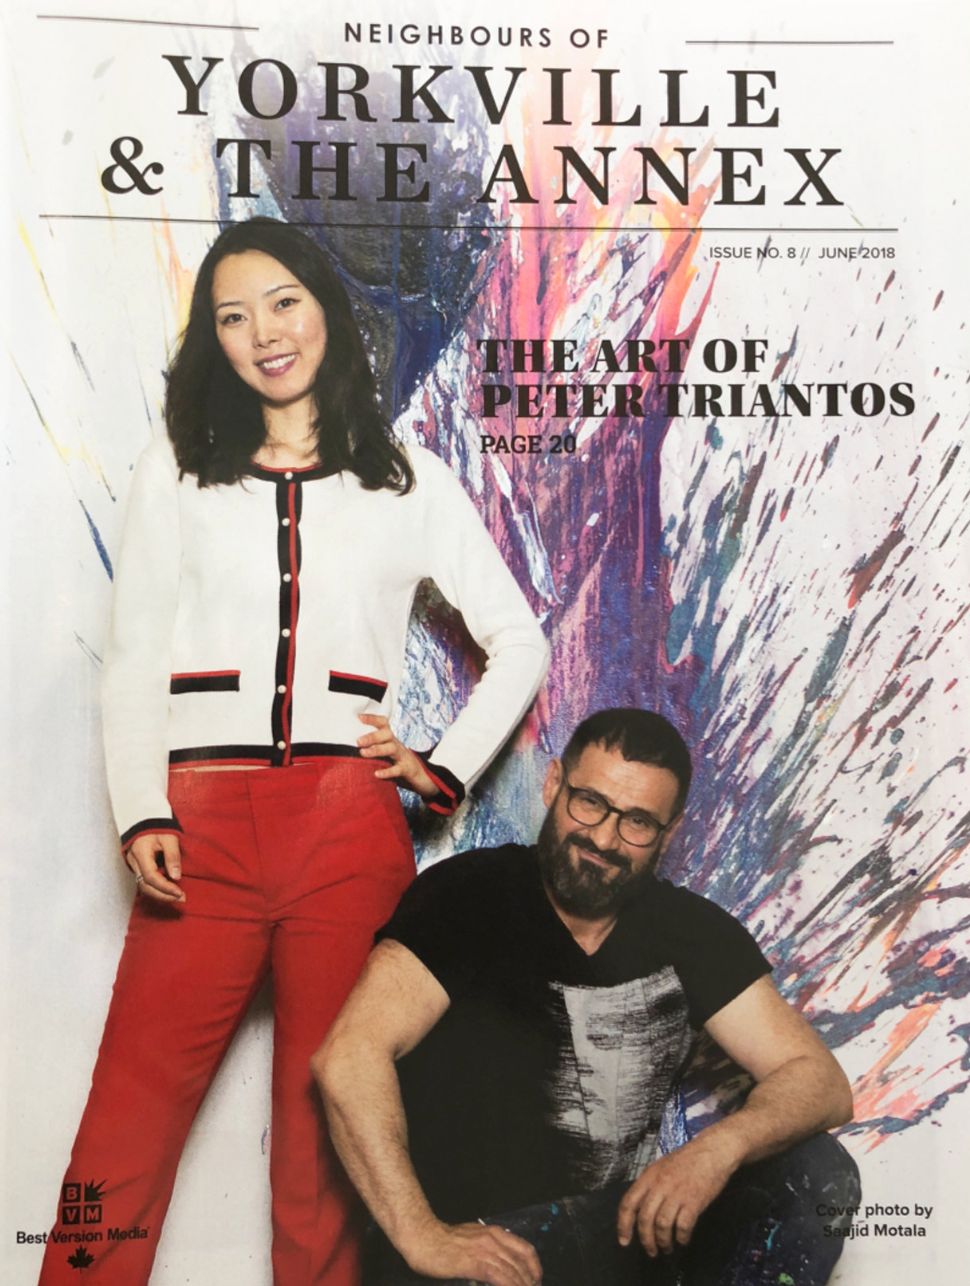 Yorkville & The Annex - June 2018